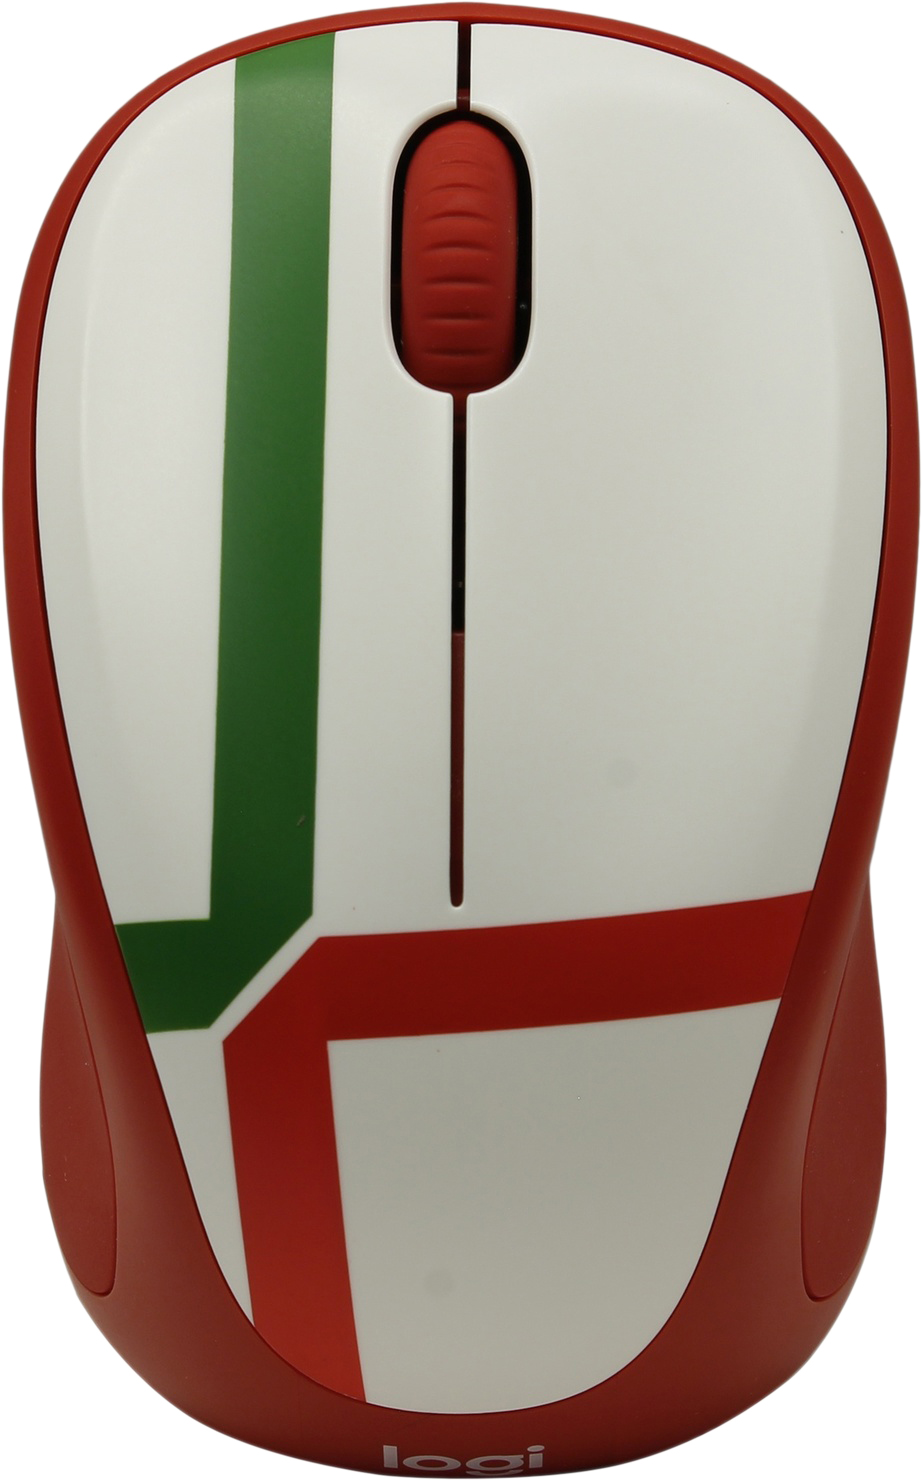 лучшая цена Мышь Logitech M238 Fan Collection Portugal, 910-005430